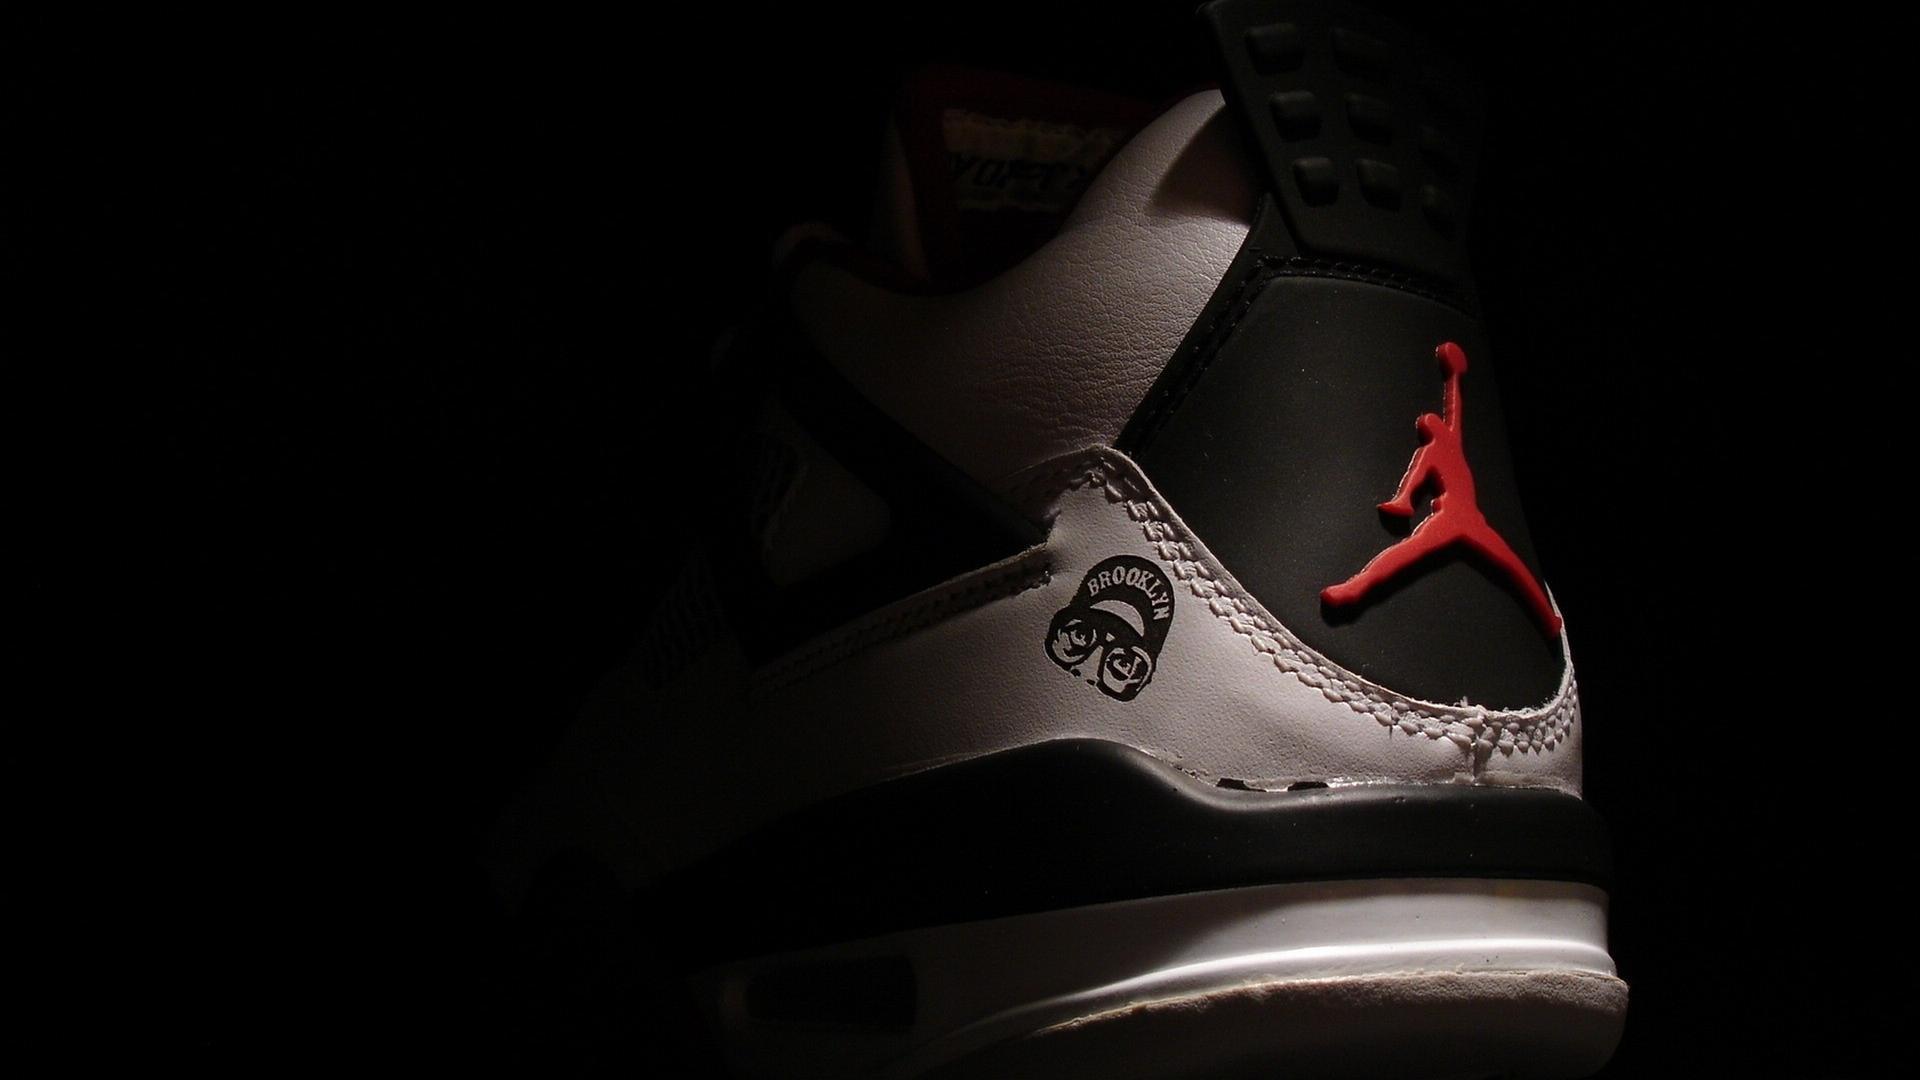 Celebrities : Michael Jordan Air Shoes Tumblr Backgrounds Cool .